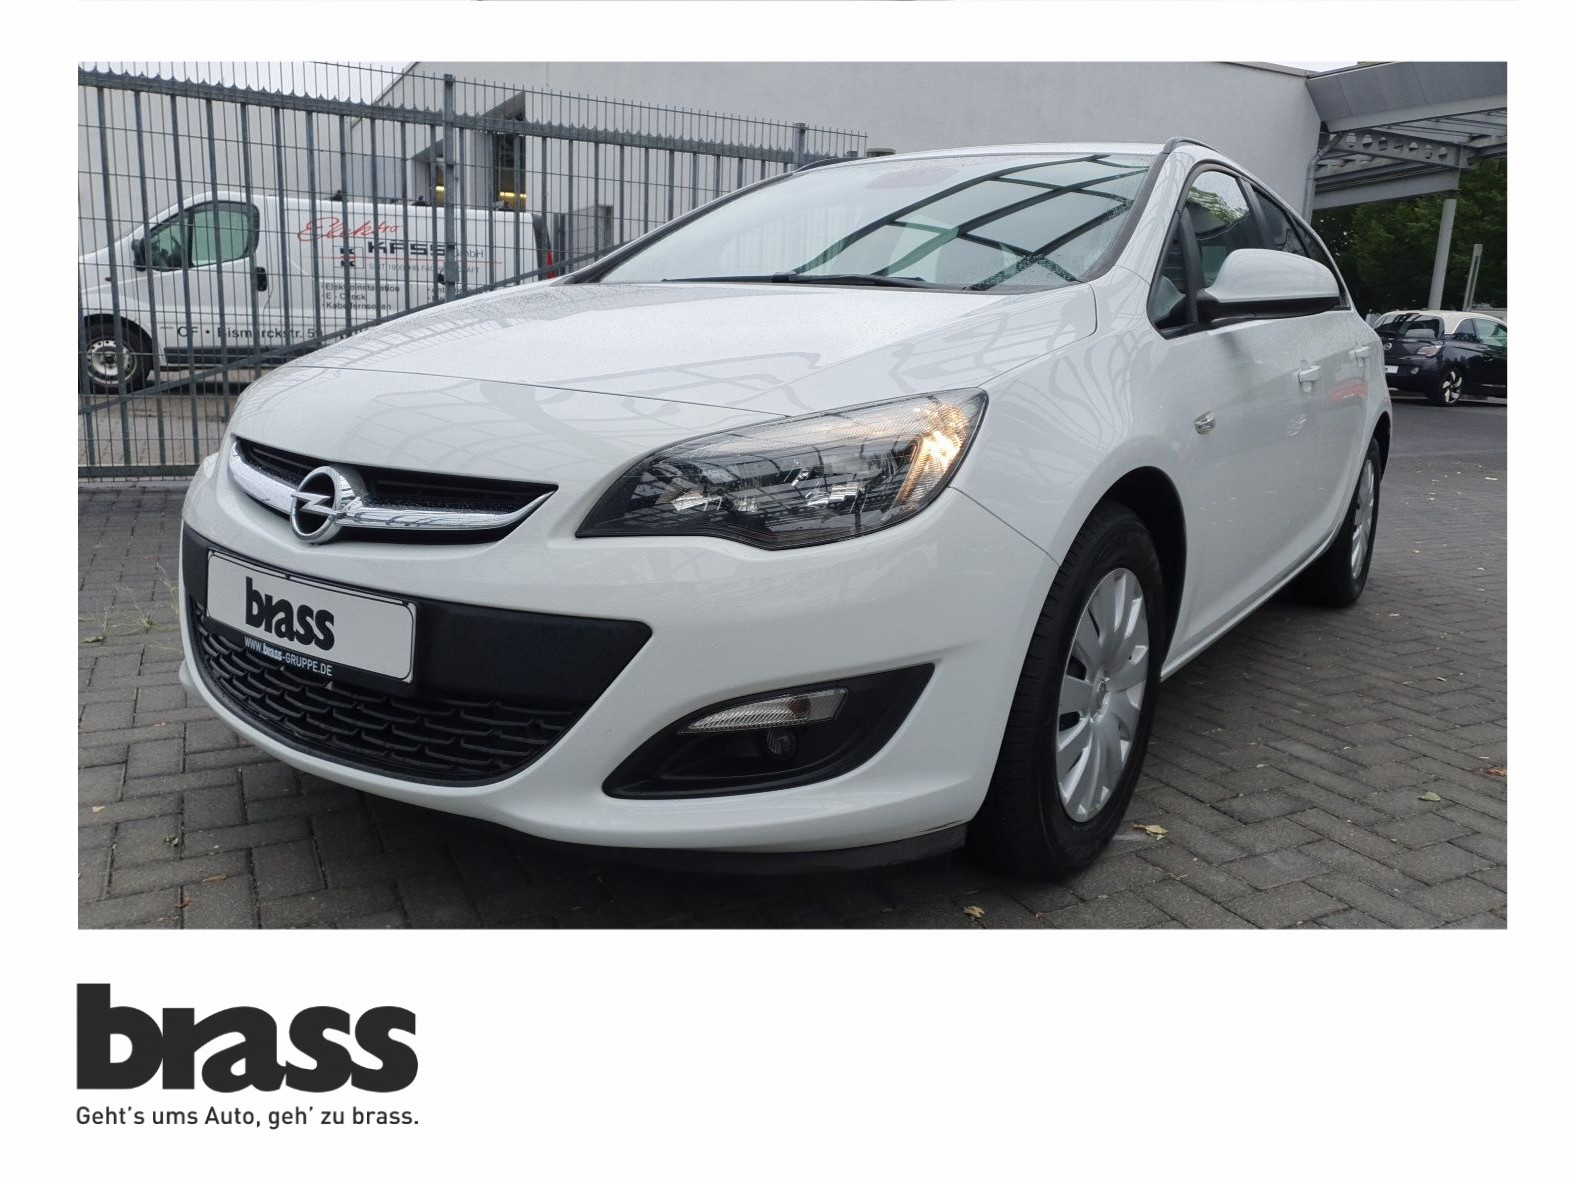 Opel Astra J 1.4 Turbo Selection ecoFlex, Jahr 2014, Benzin